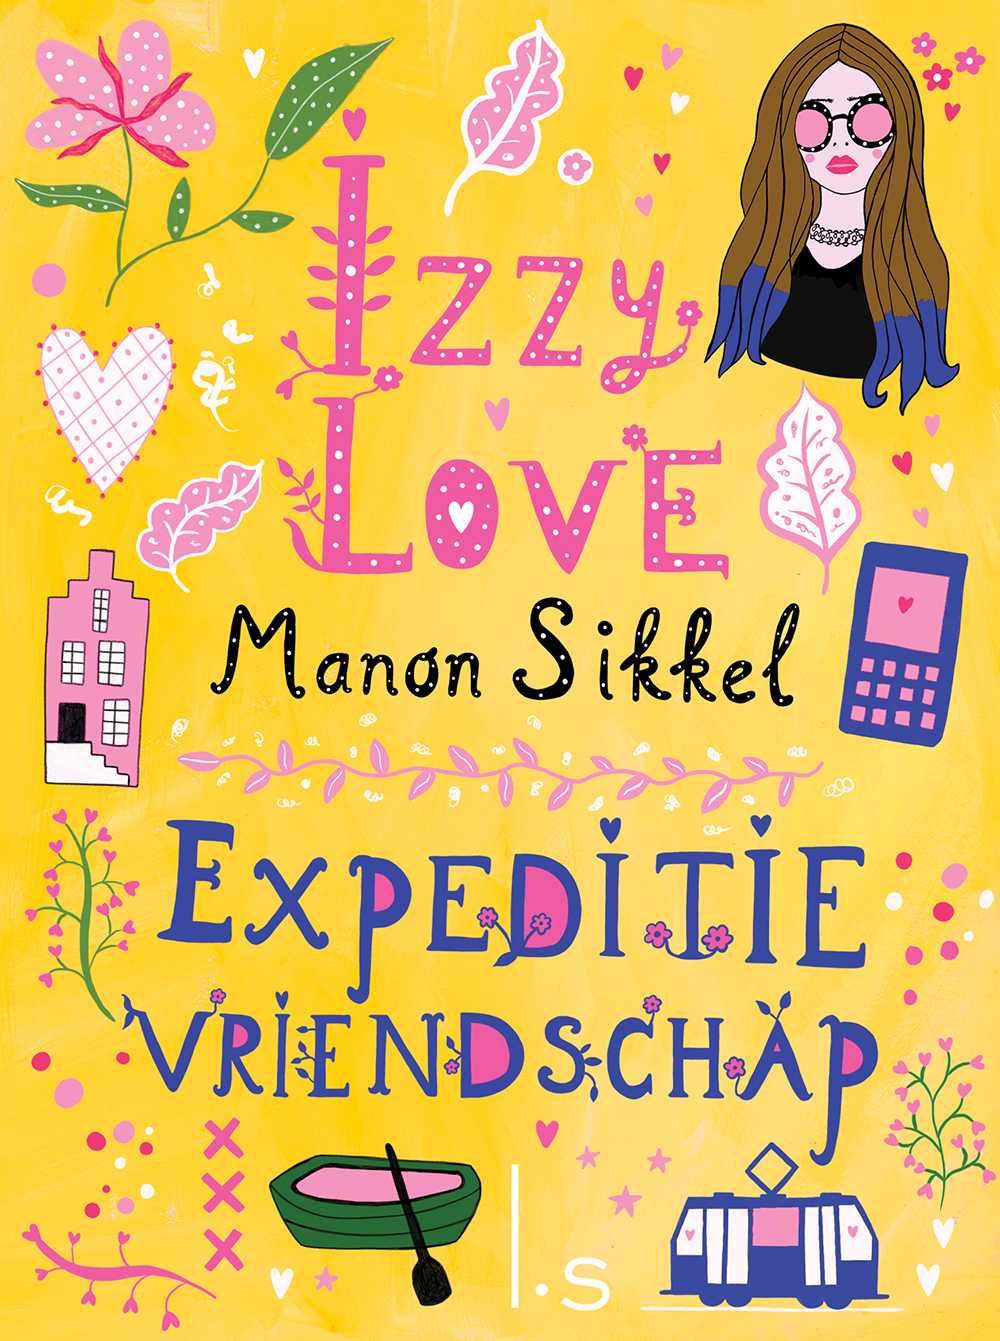 Books Izzy Love, client: Luitingh Sijthoff